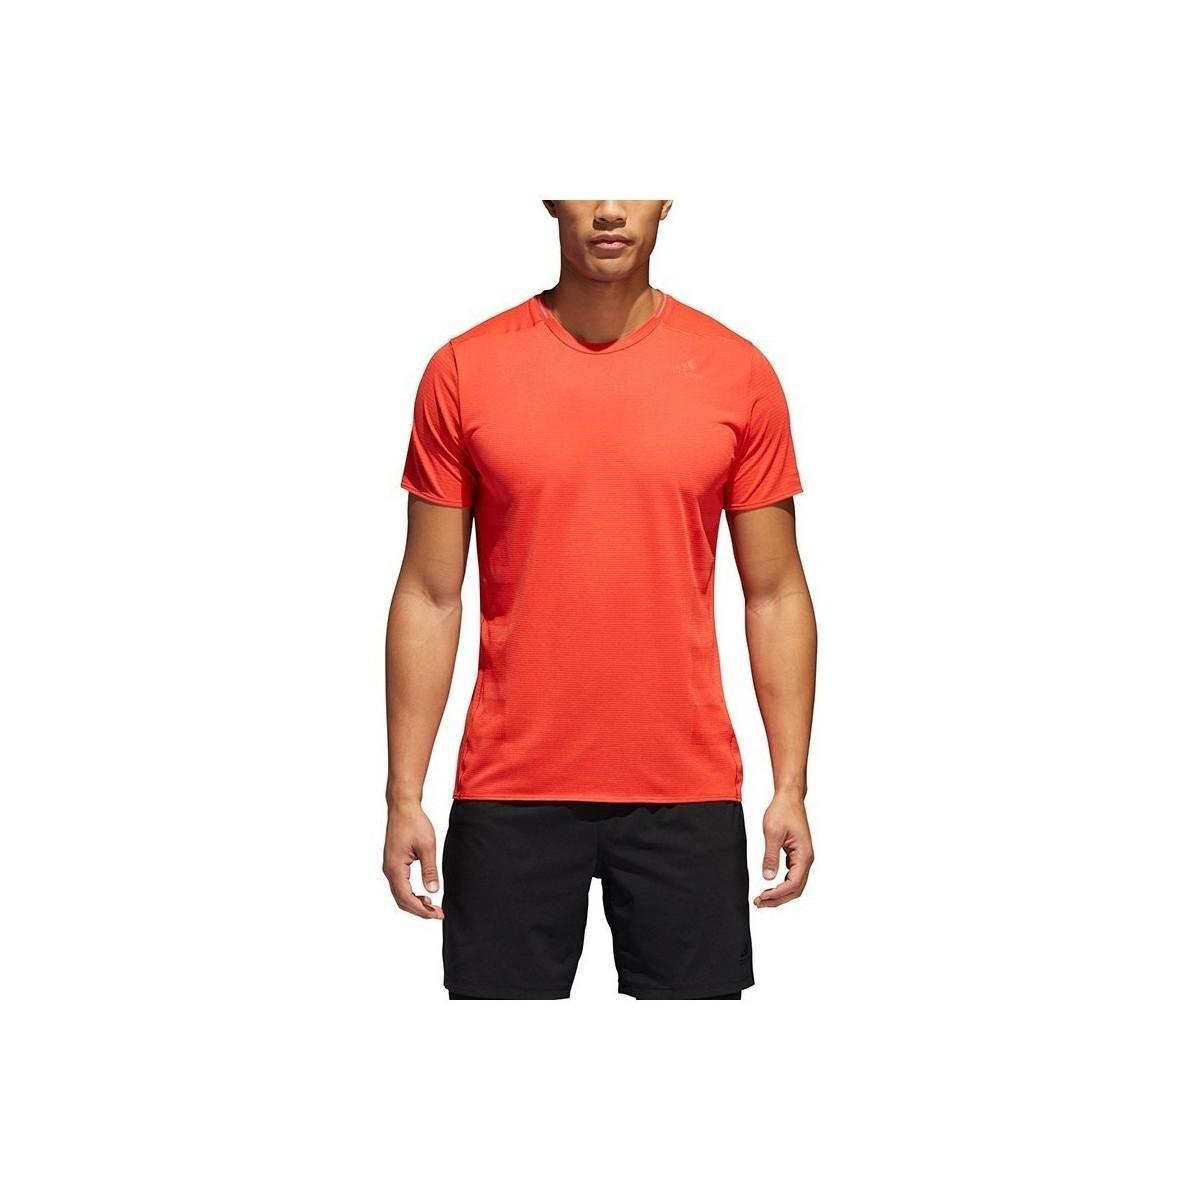 Lyst - Adidas Supernova Tee M Men s T Shirt In Orange in Orange for Men 53a0183bc